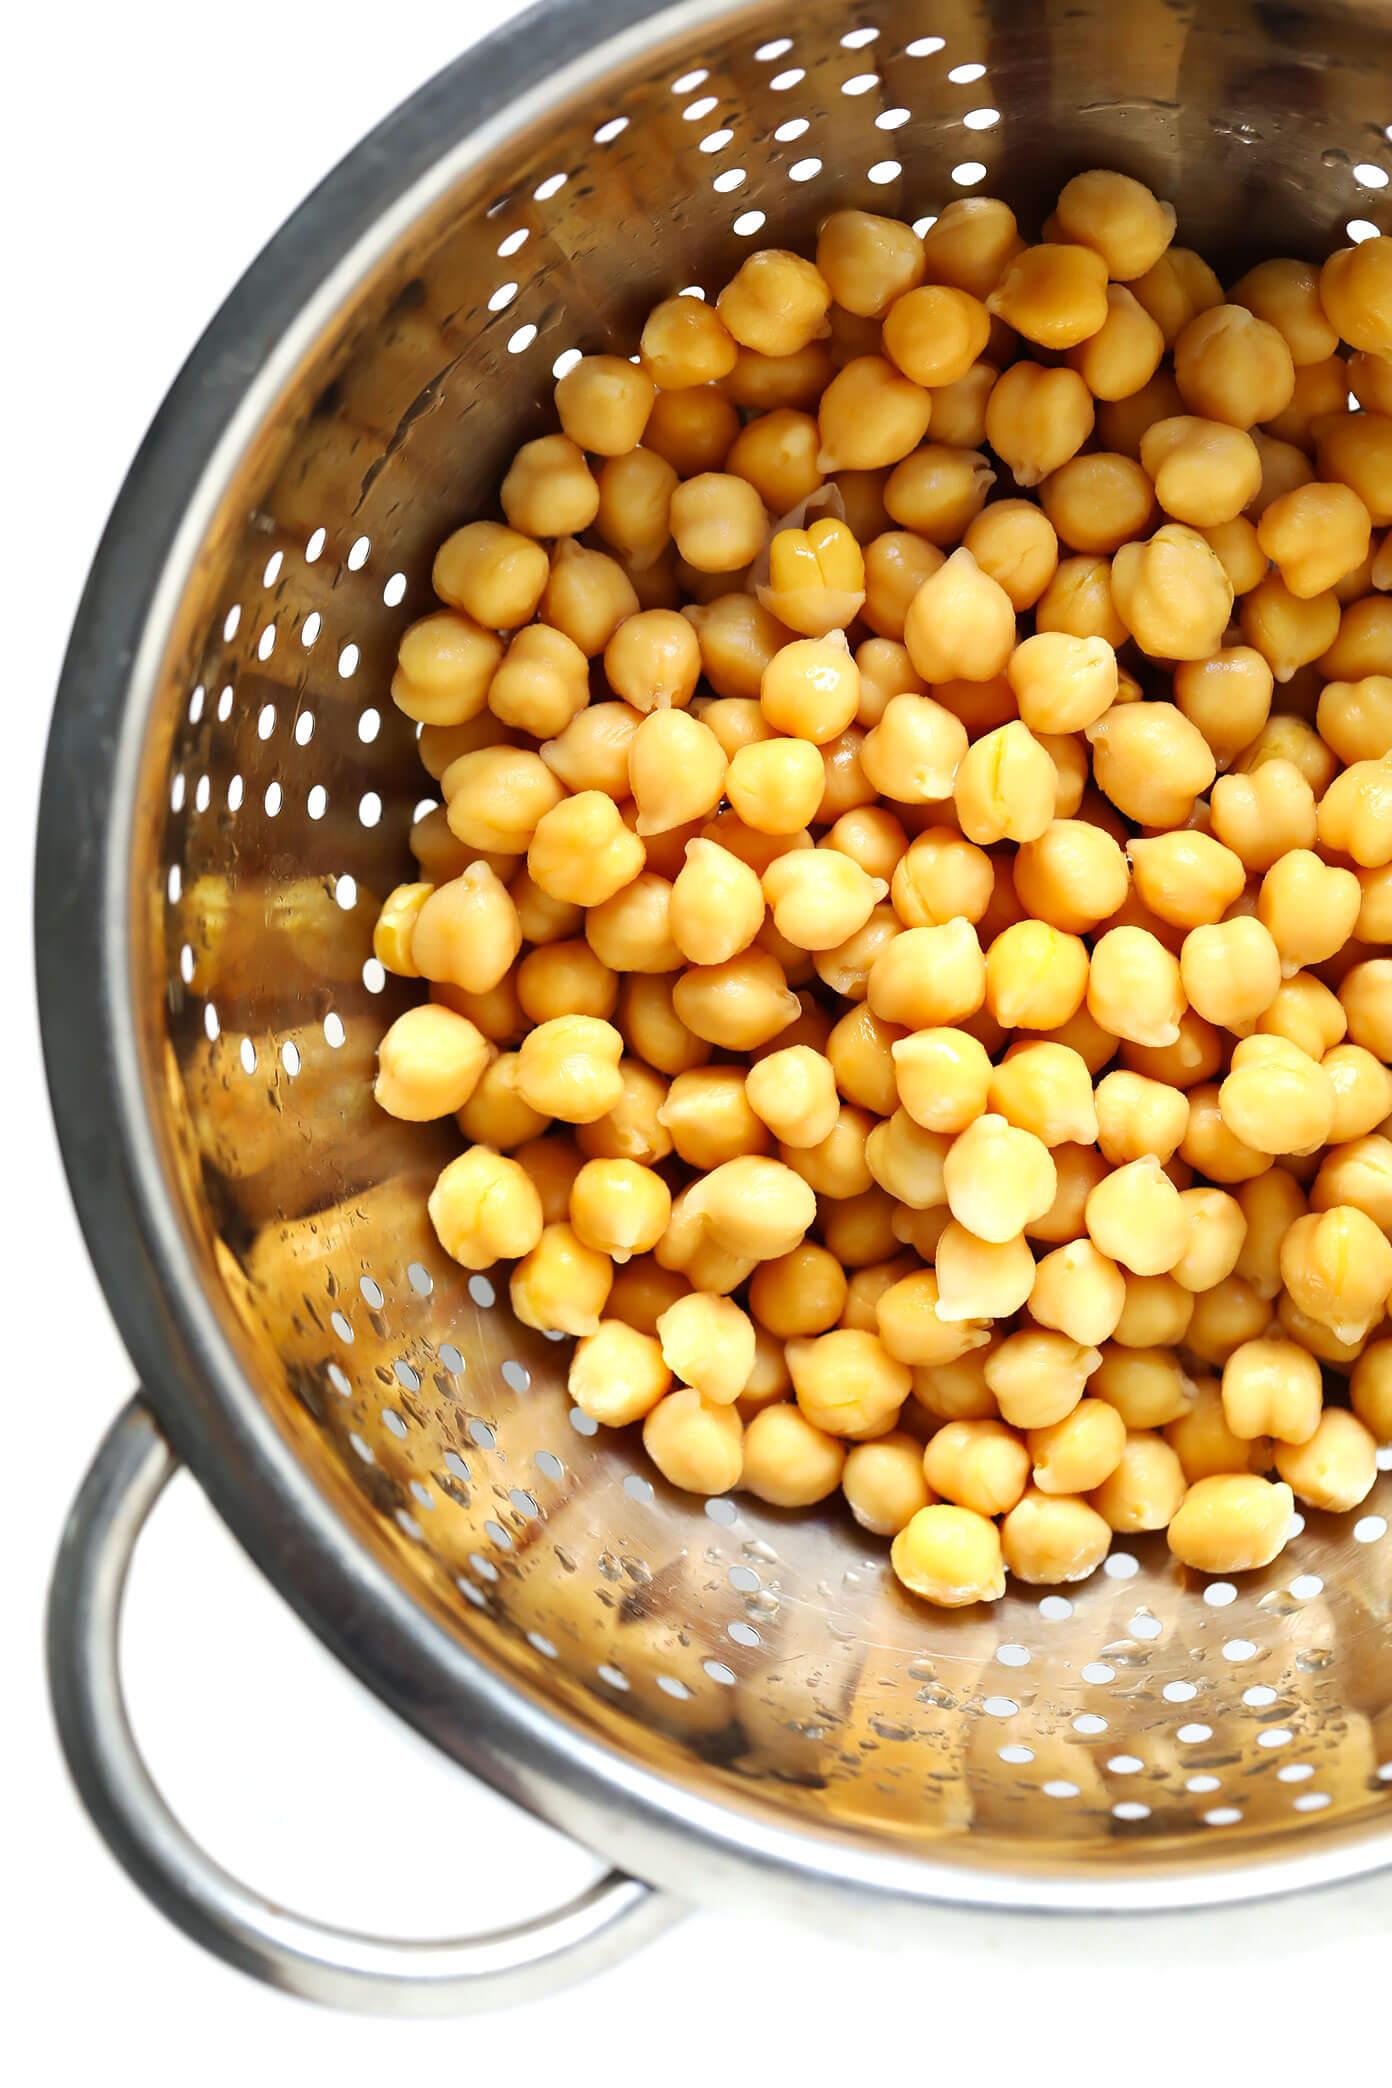 Chickpeas to make Vegetarian Avgolemono Soup